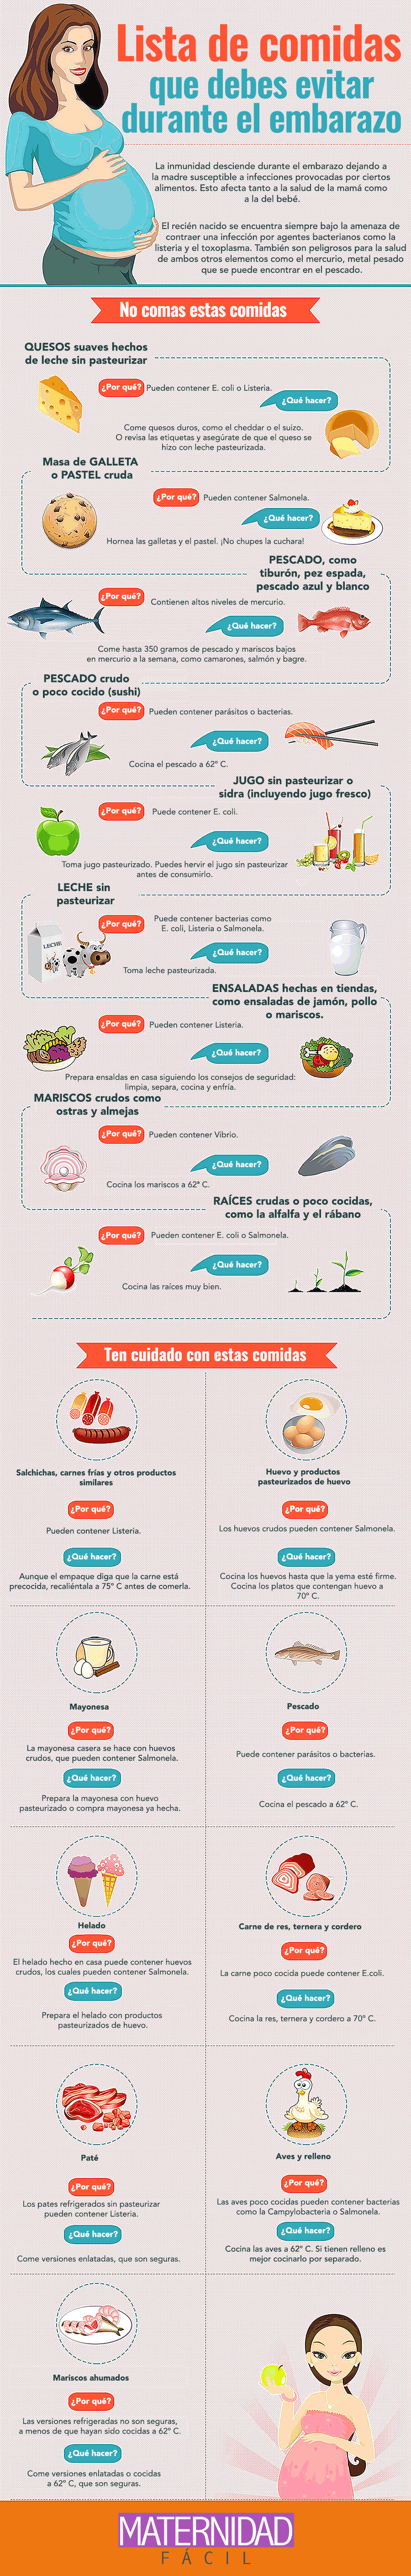 Alimentos prohibidos embarazo 0 beb s embarazo pinterest embarazo alimentos y bebe - Embarazo y alimentos prohibidos ...